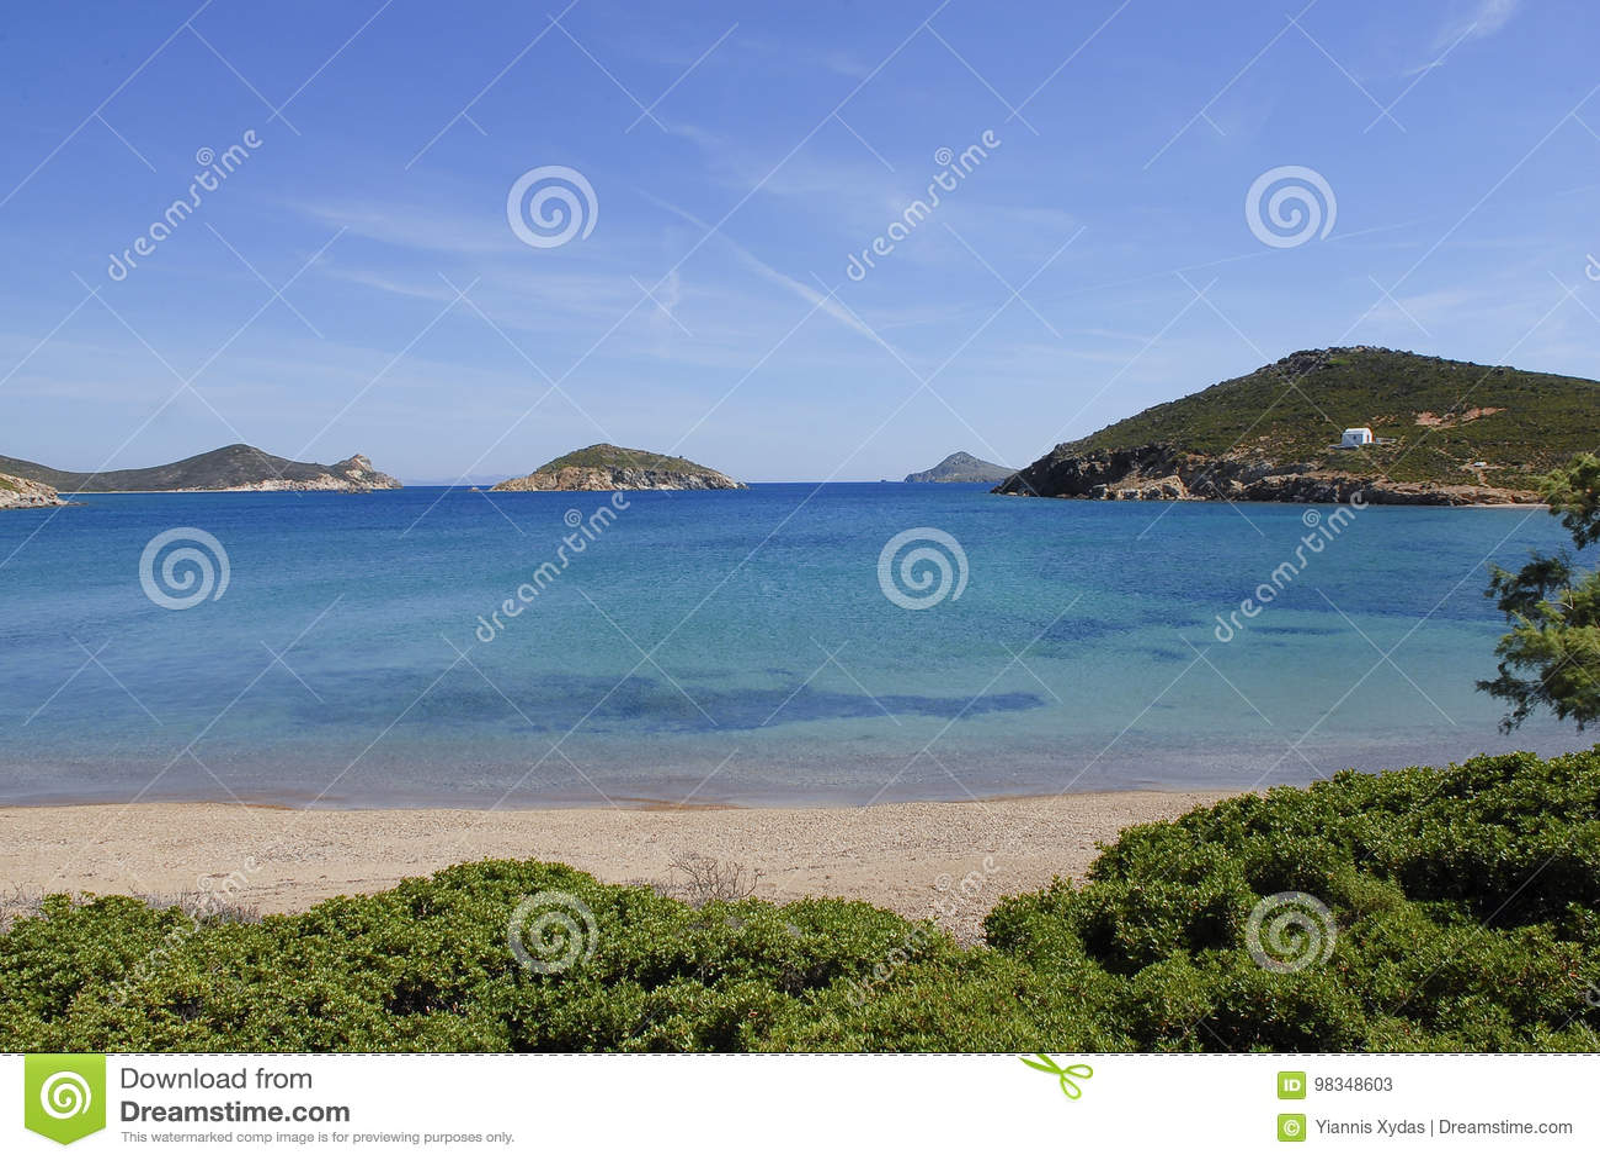 Isola di Patmos, Grecia